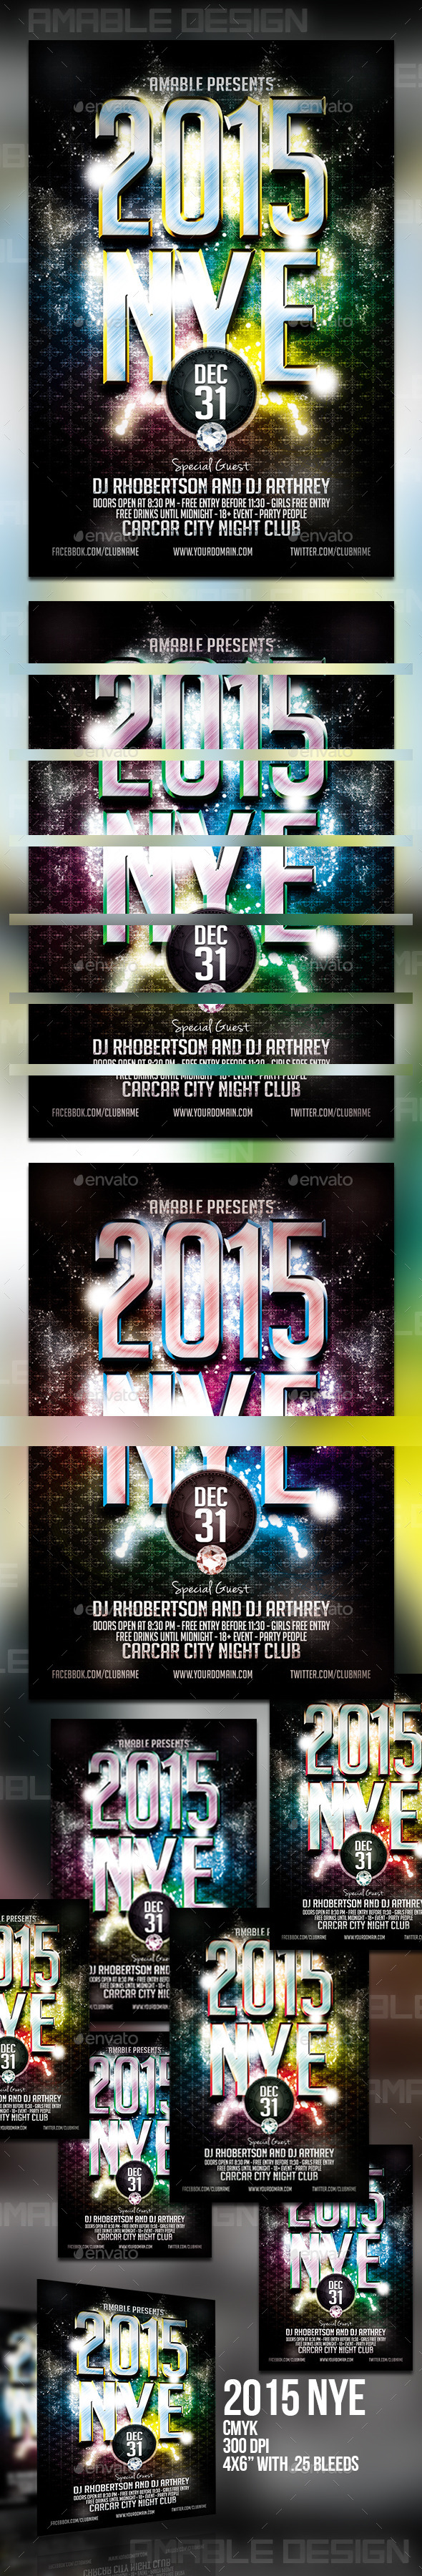 2015 NYE Flyer - Events Flyers